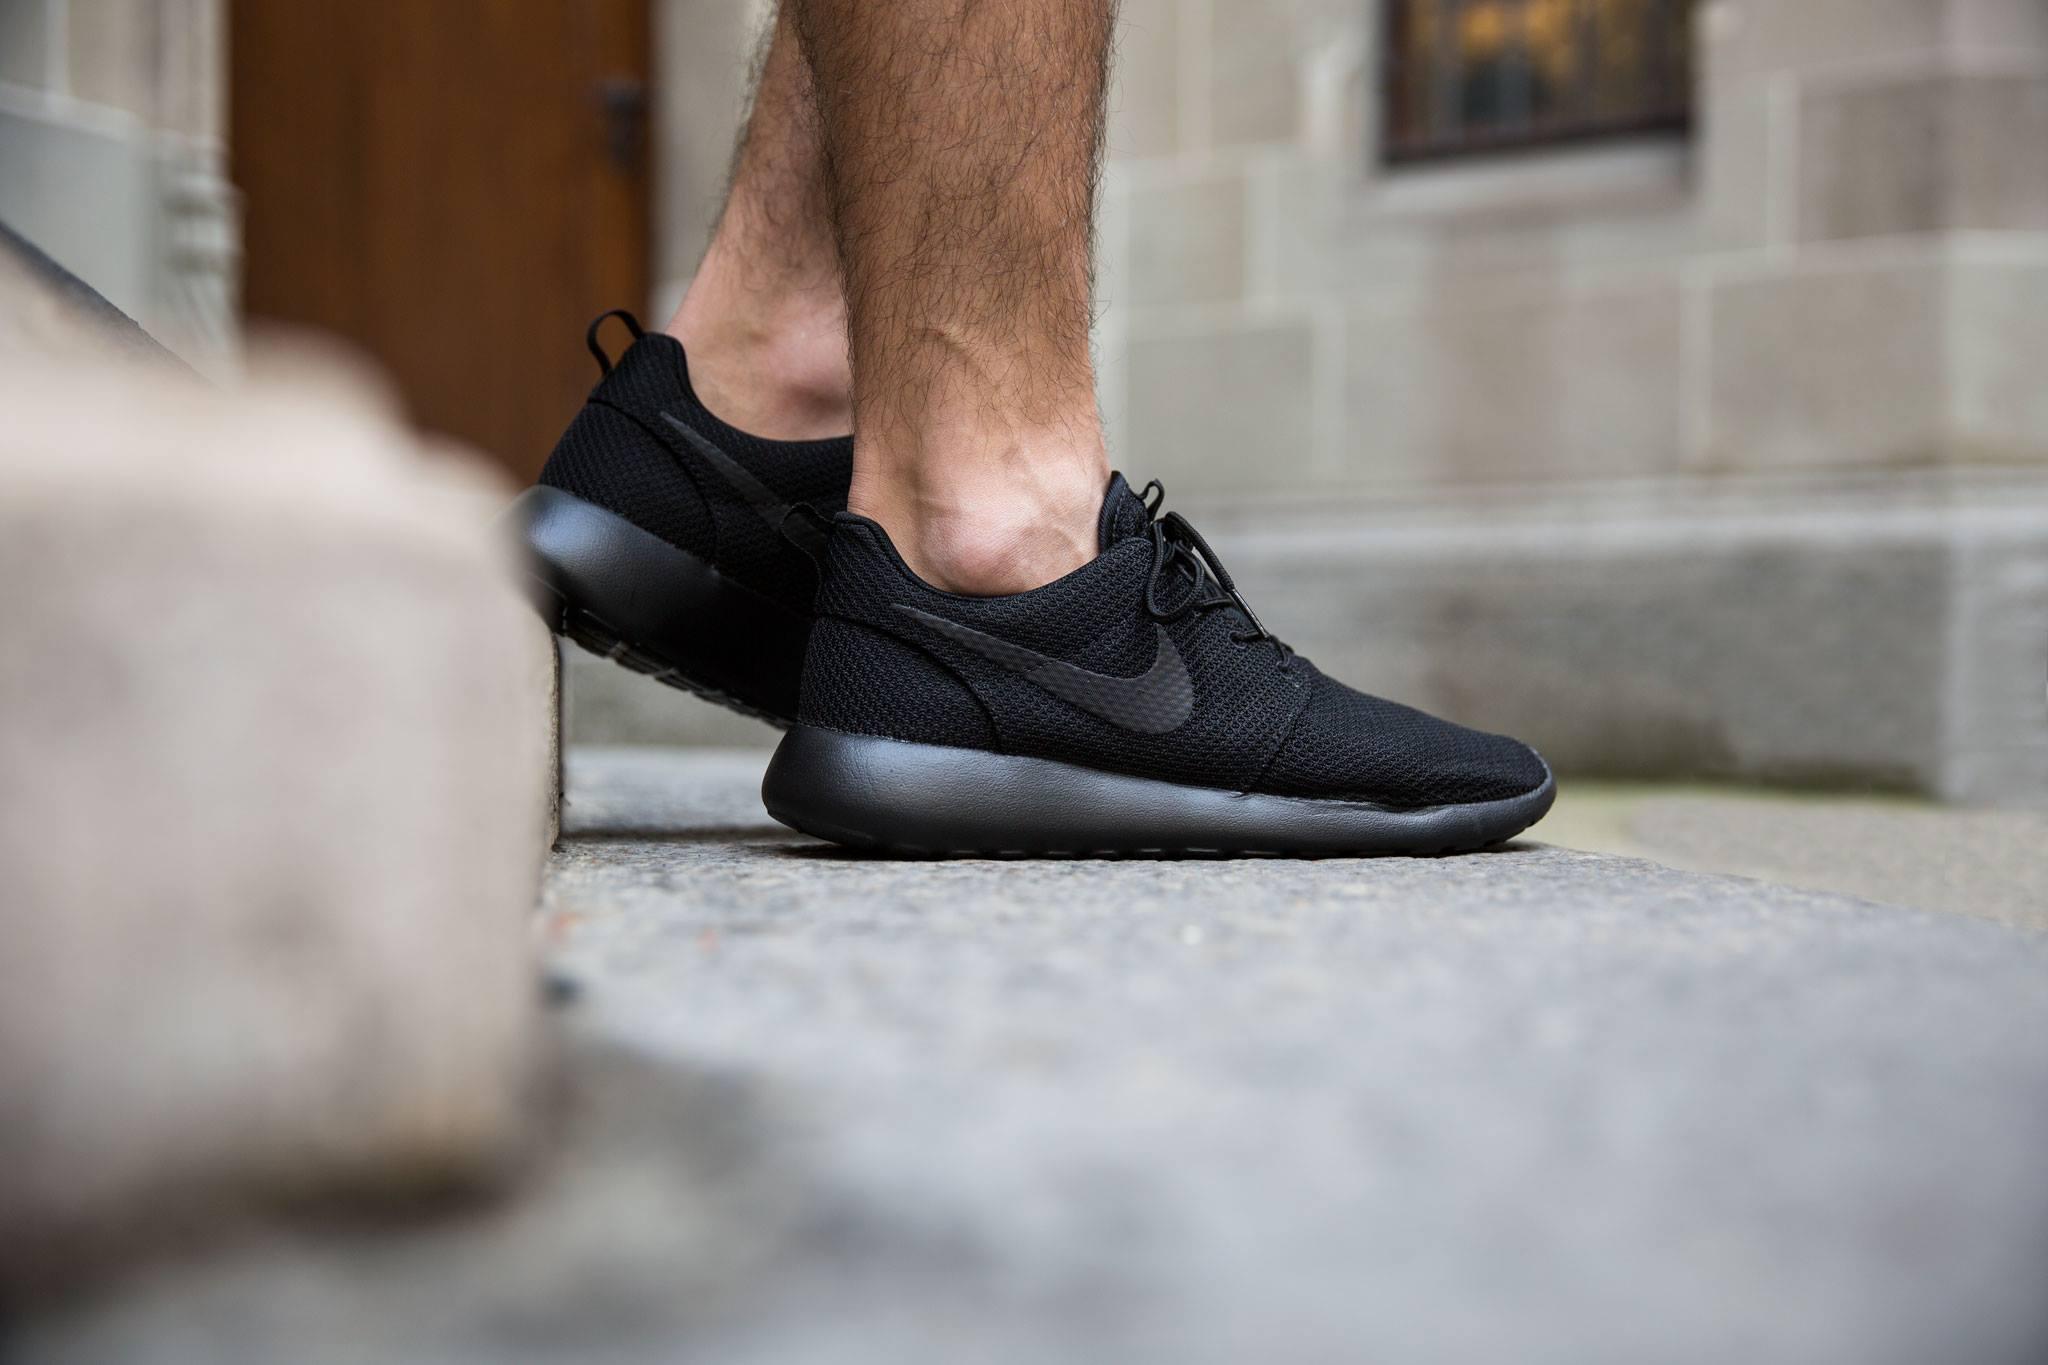 The All-Black Nike Roshe One